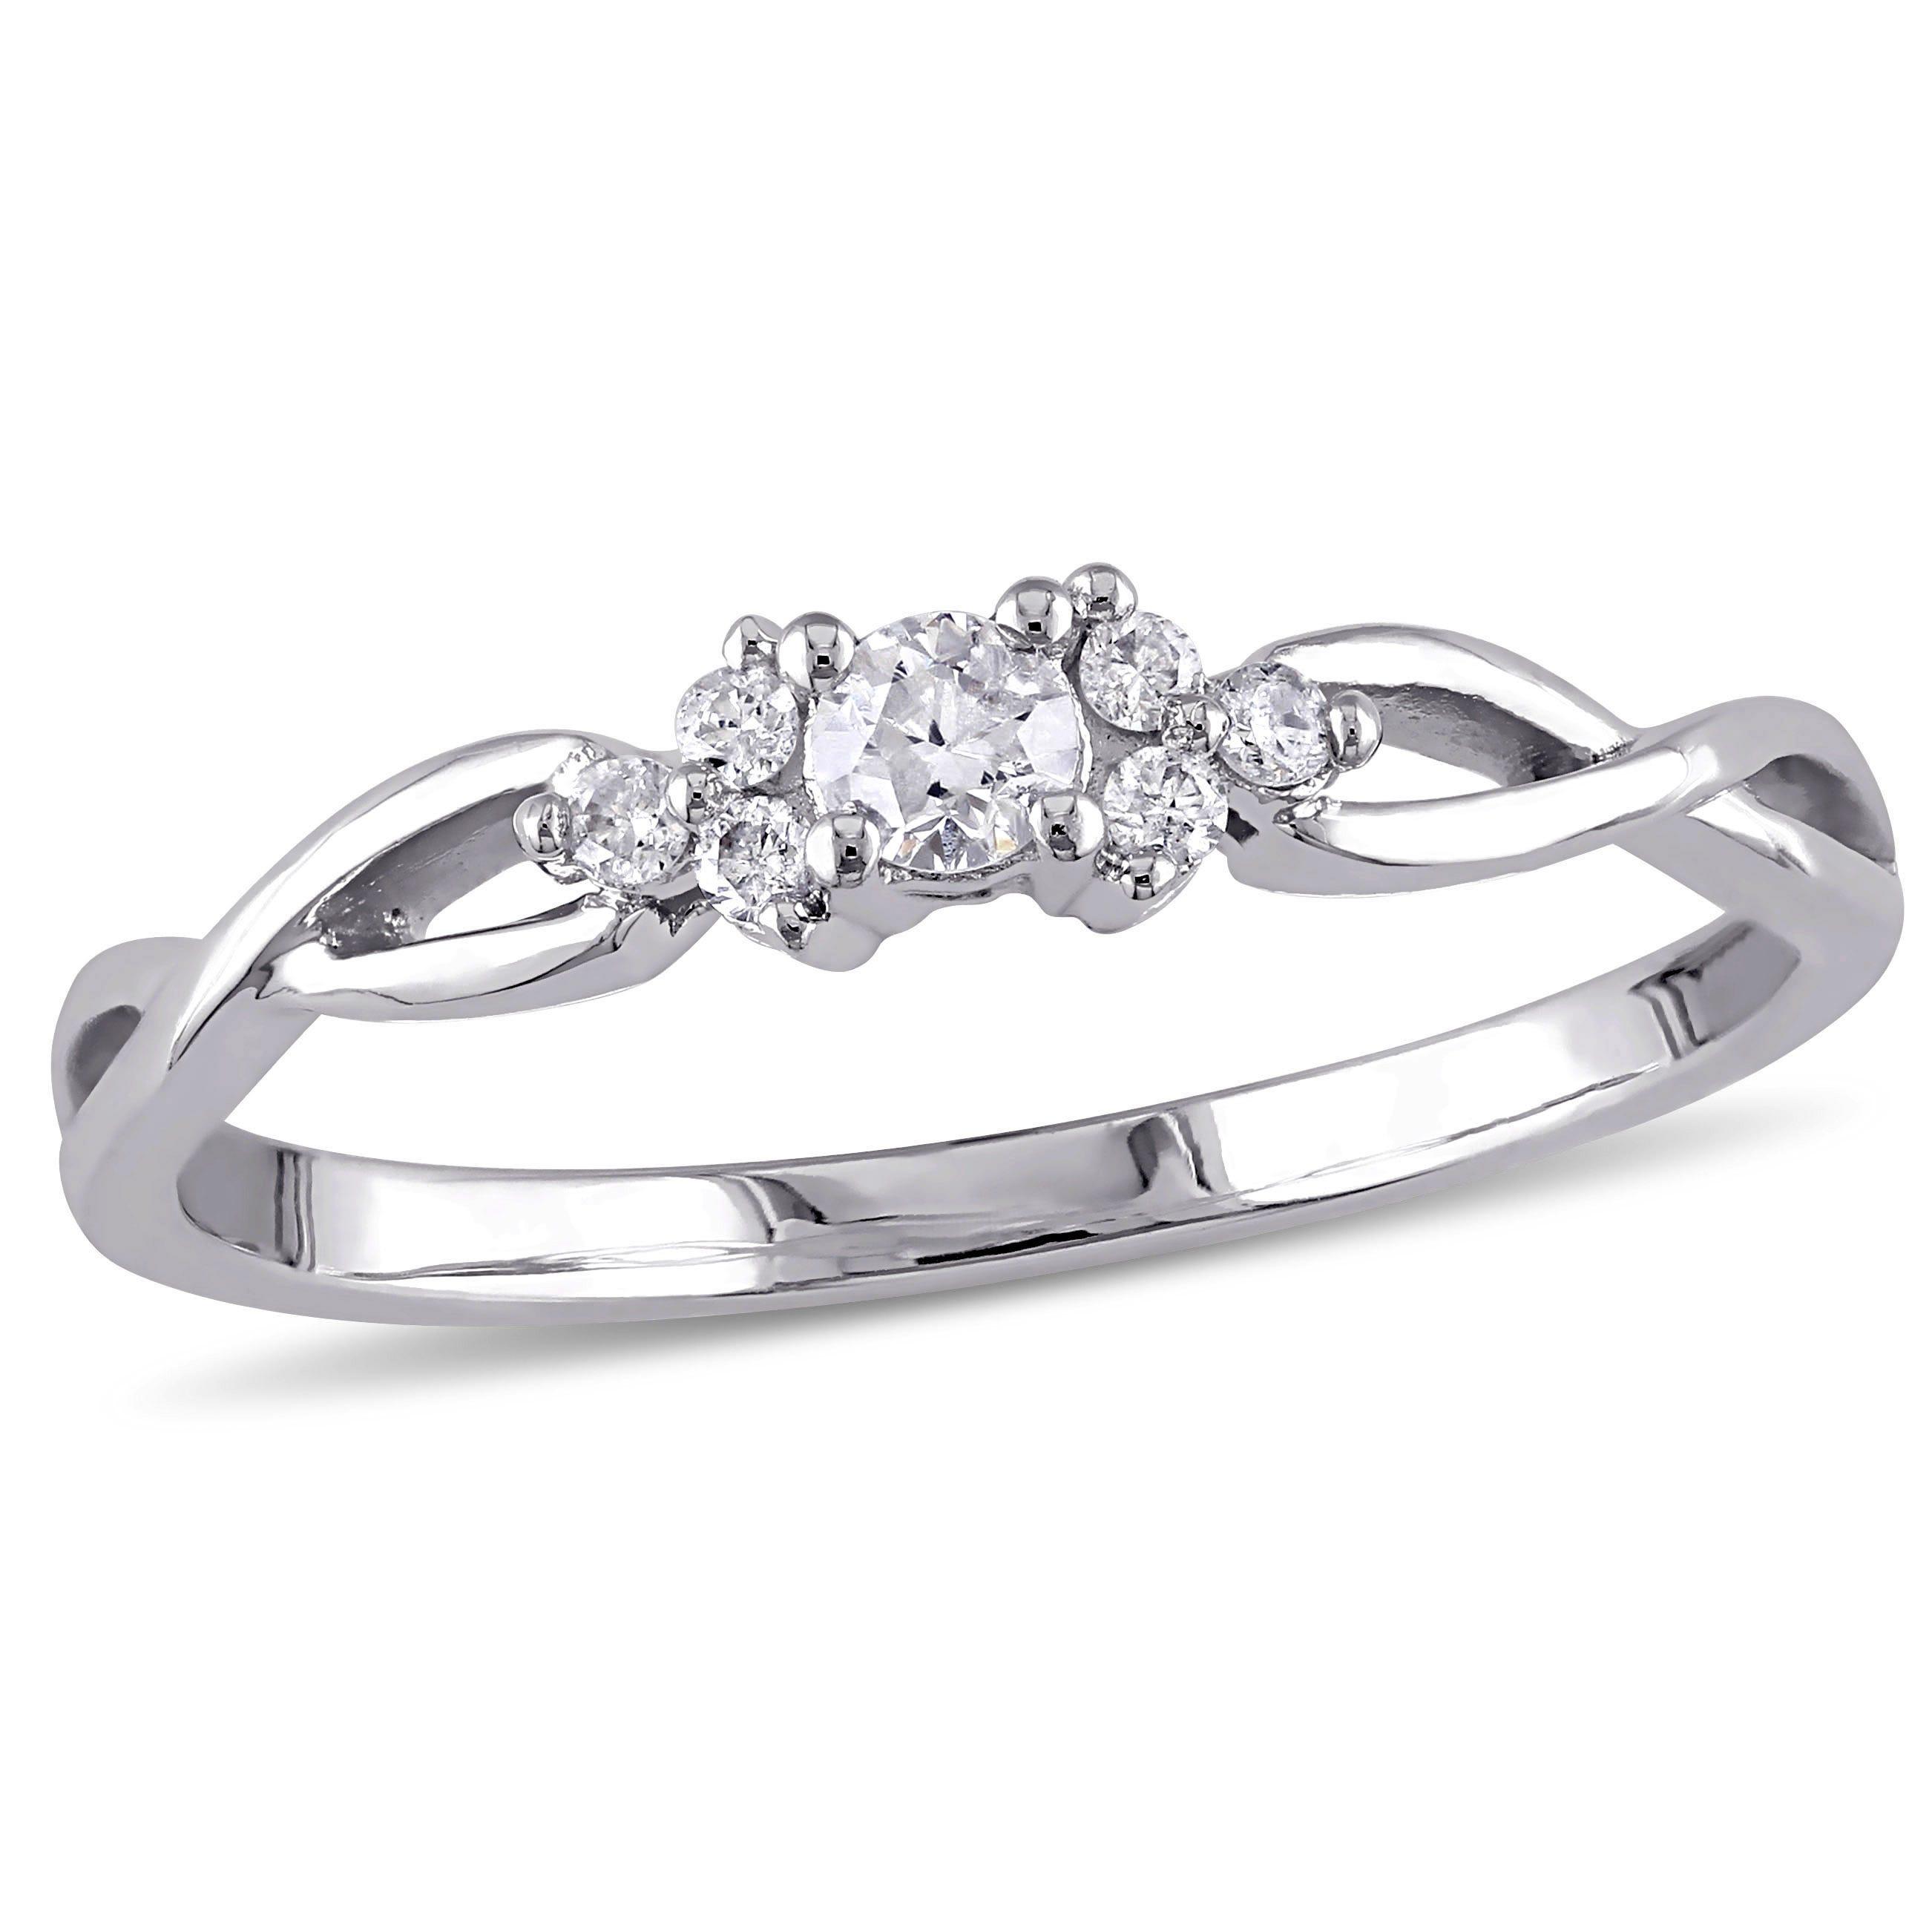 Round Cut Diamond Trillium Infinity Promise Ring 1/6ctw. in 10k White Gold